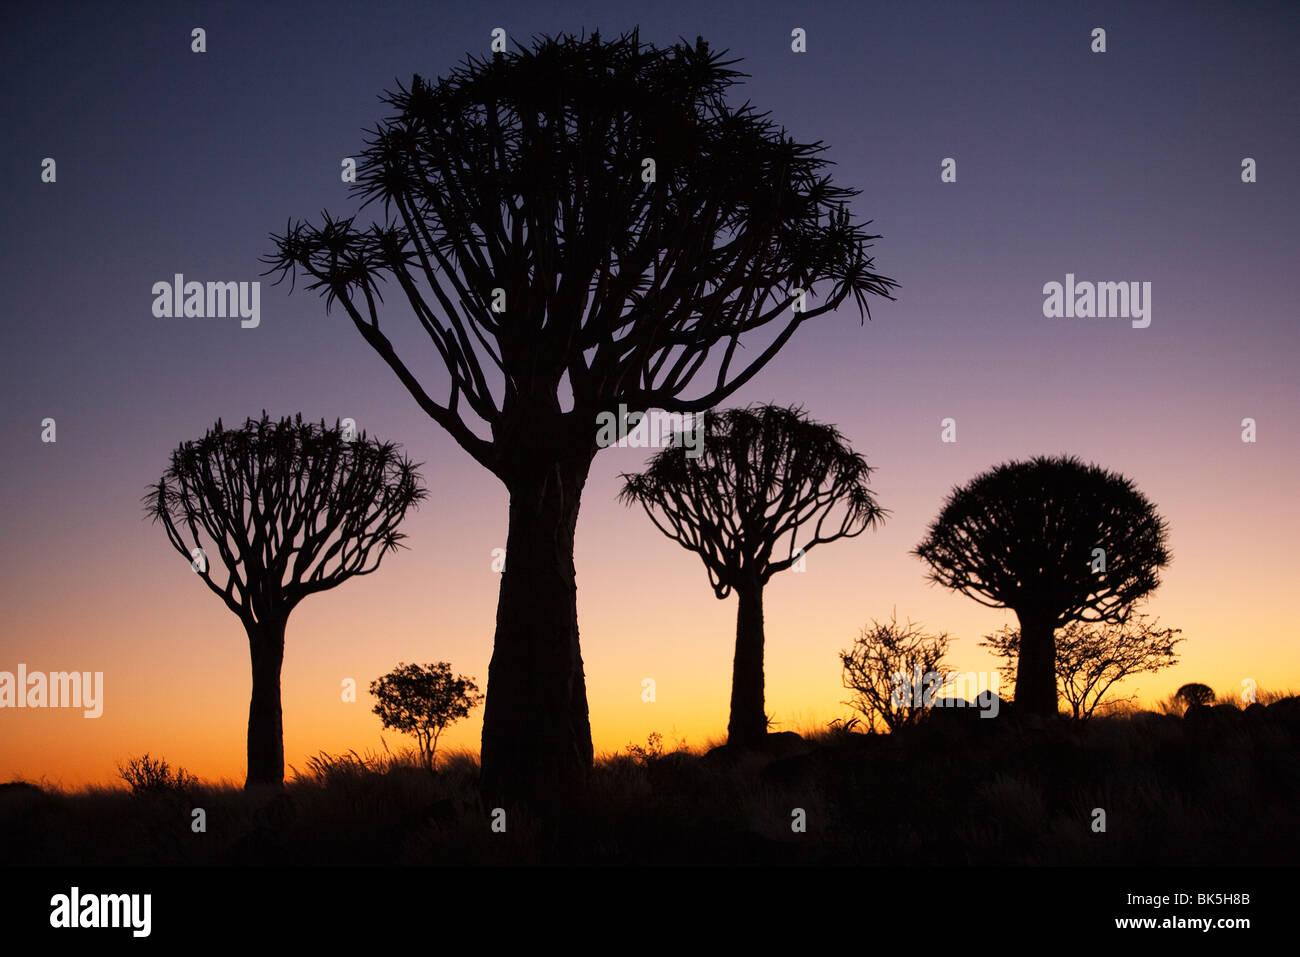 Zittern Sie Bäume (Aloe Dichotoma), zucken Sie Baum Wald Silhouette, Keetmanshoop, Namibia, Afrika Stockfoto